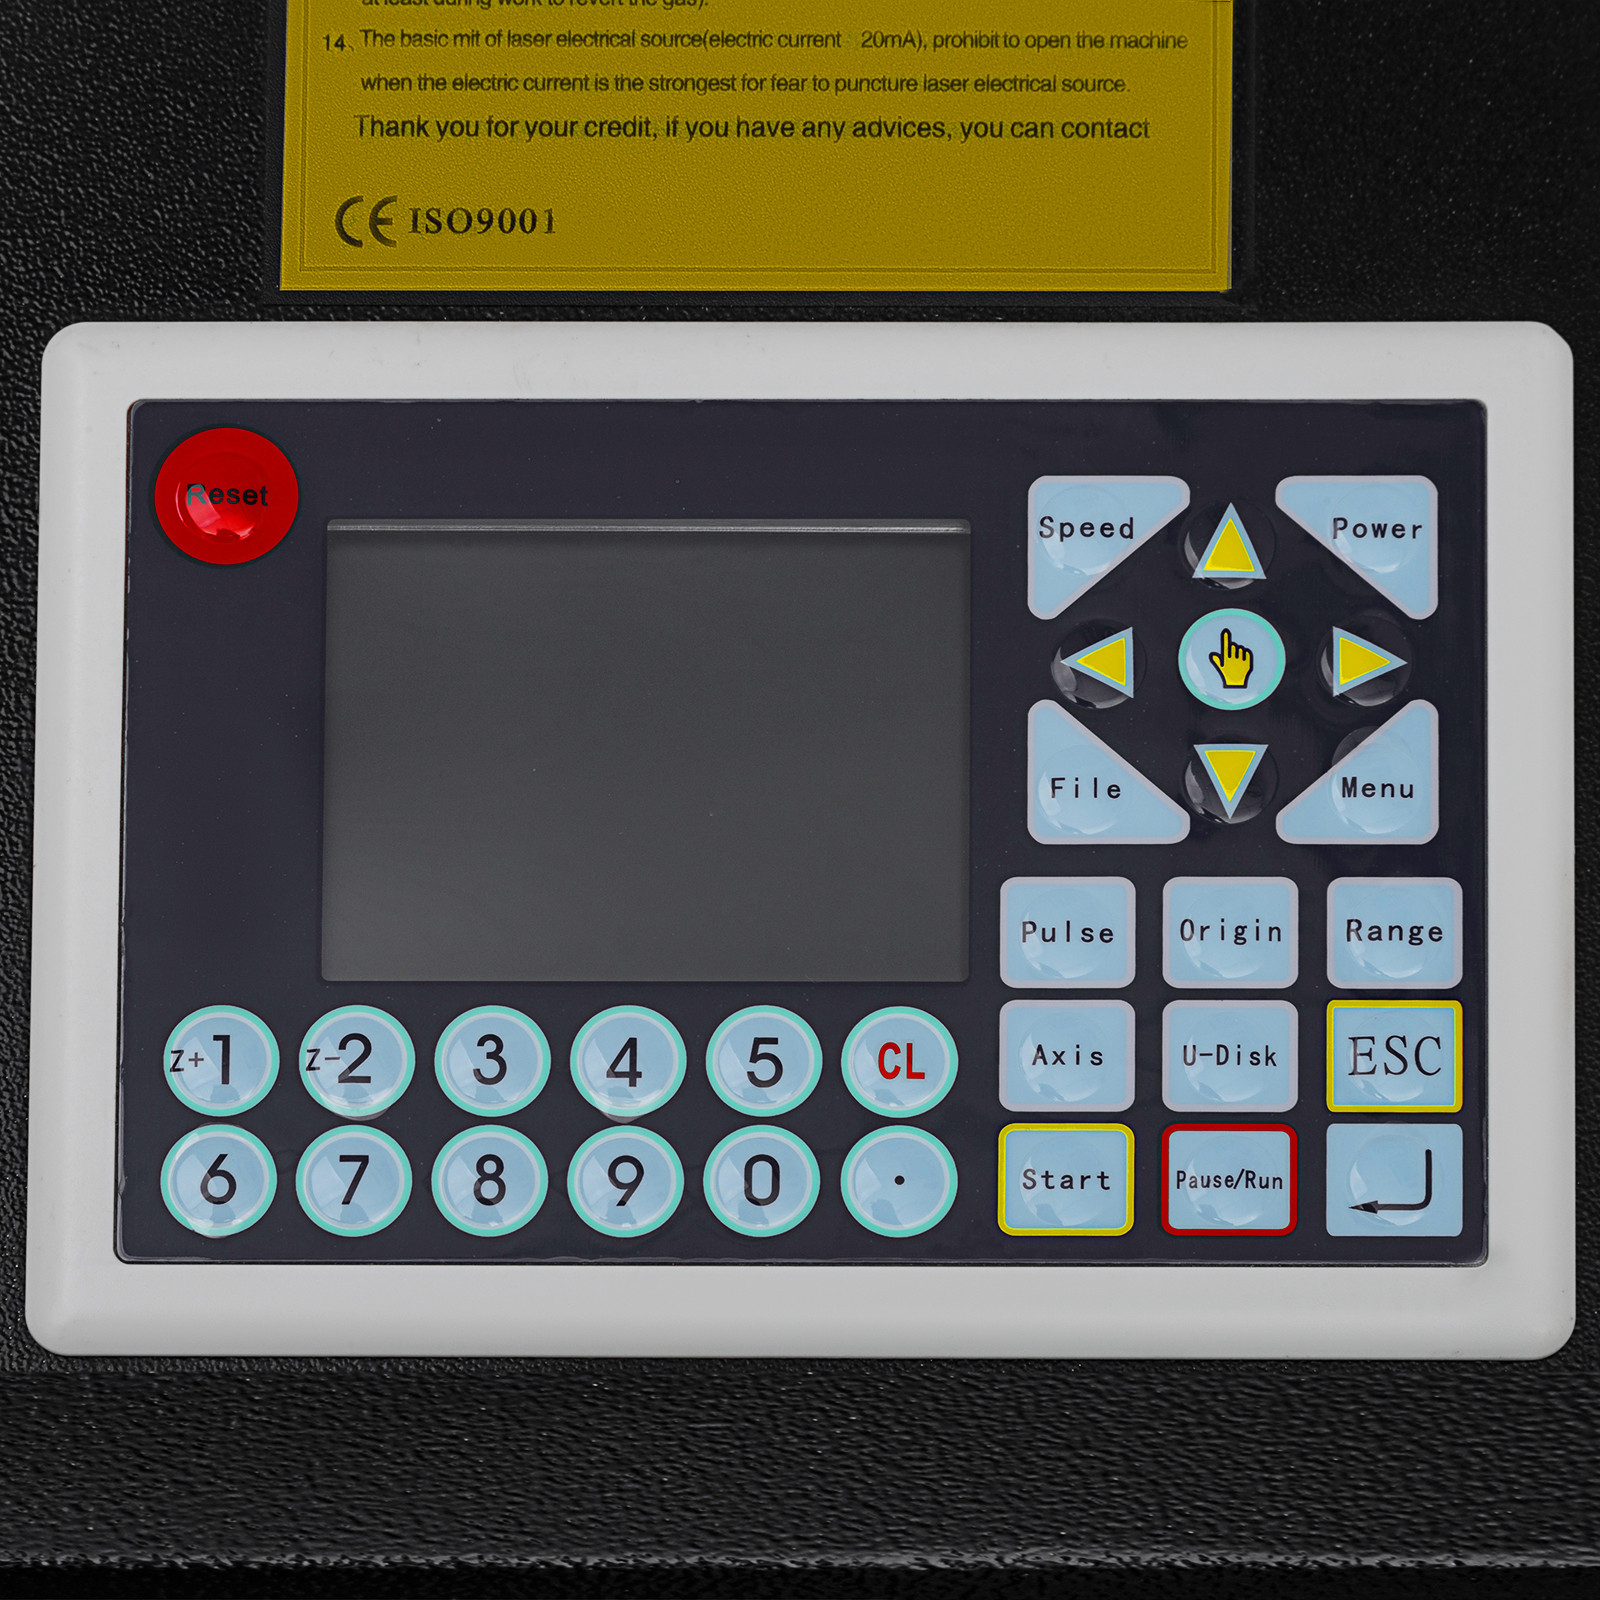 Macchina-per-Incisione-Laser-CO2-40-130W-Asse-Rotante-Tagliatrice-Incisore miniatura 54